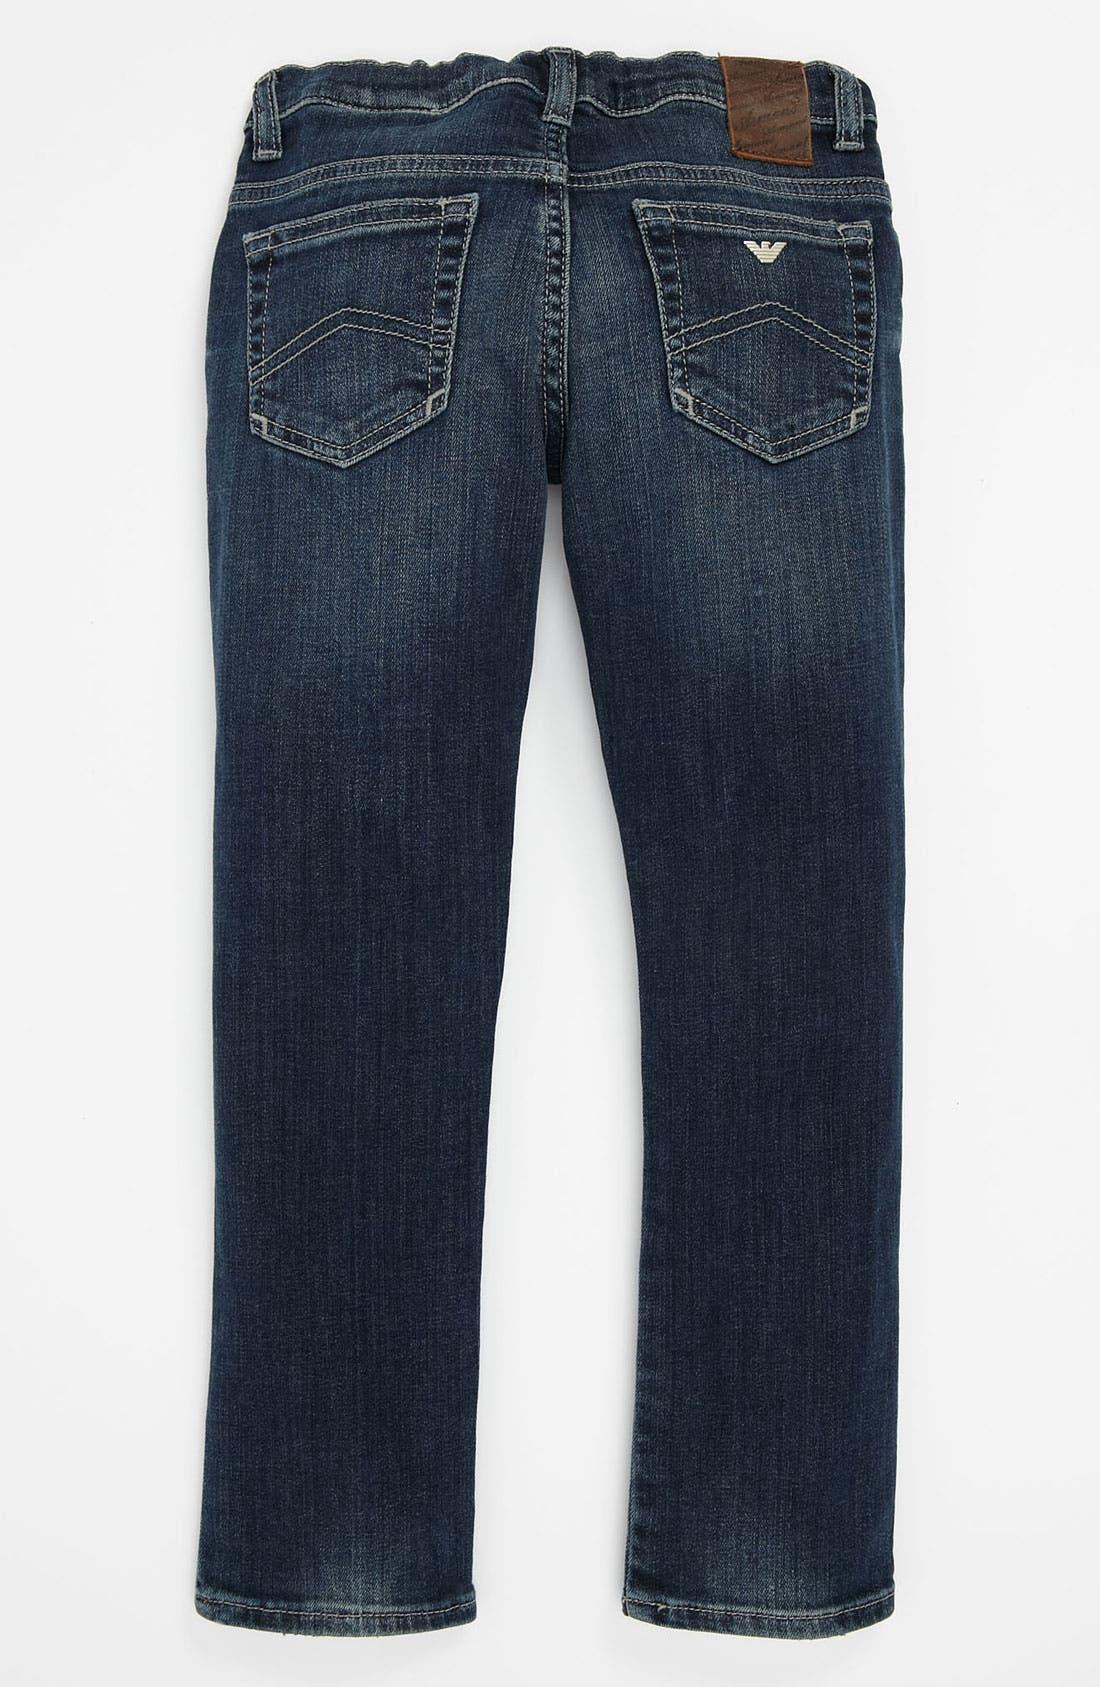 Alternate Image 1 Selected - Armani Junior Super Slim Jeans (Toddler & Little Girls)